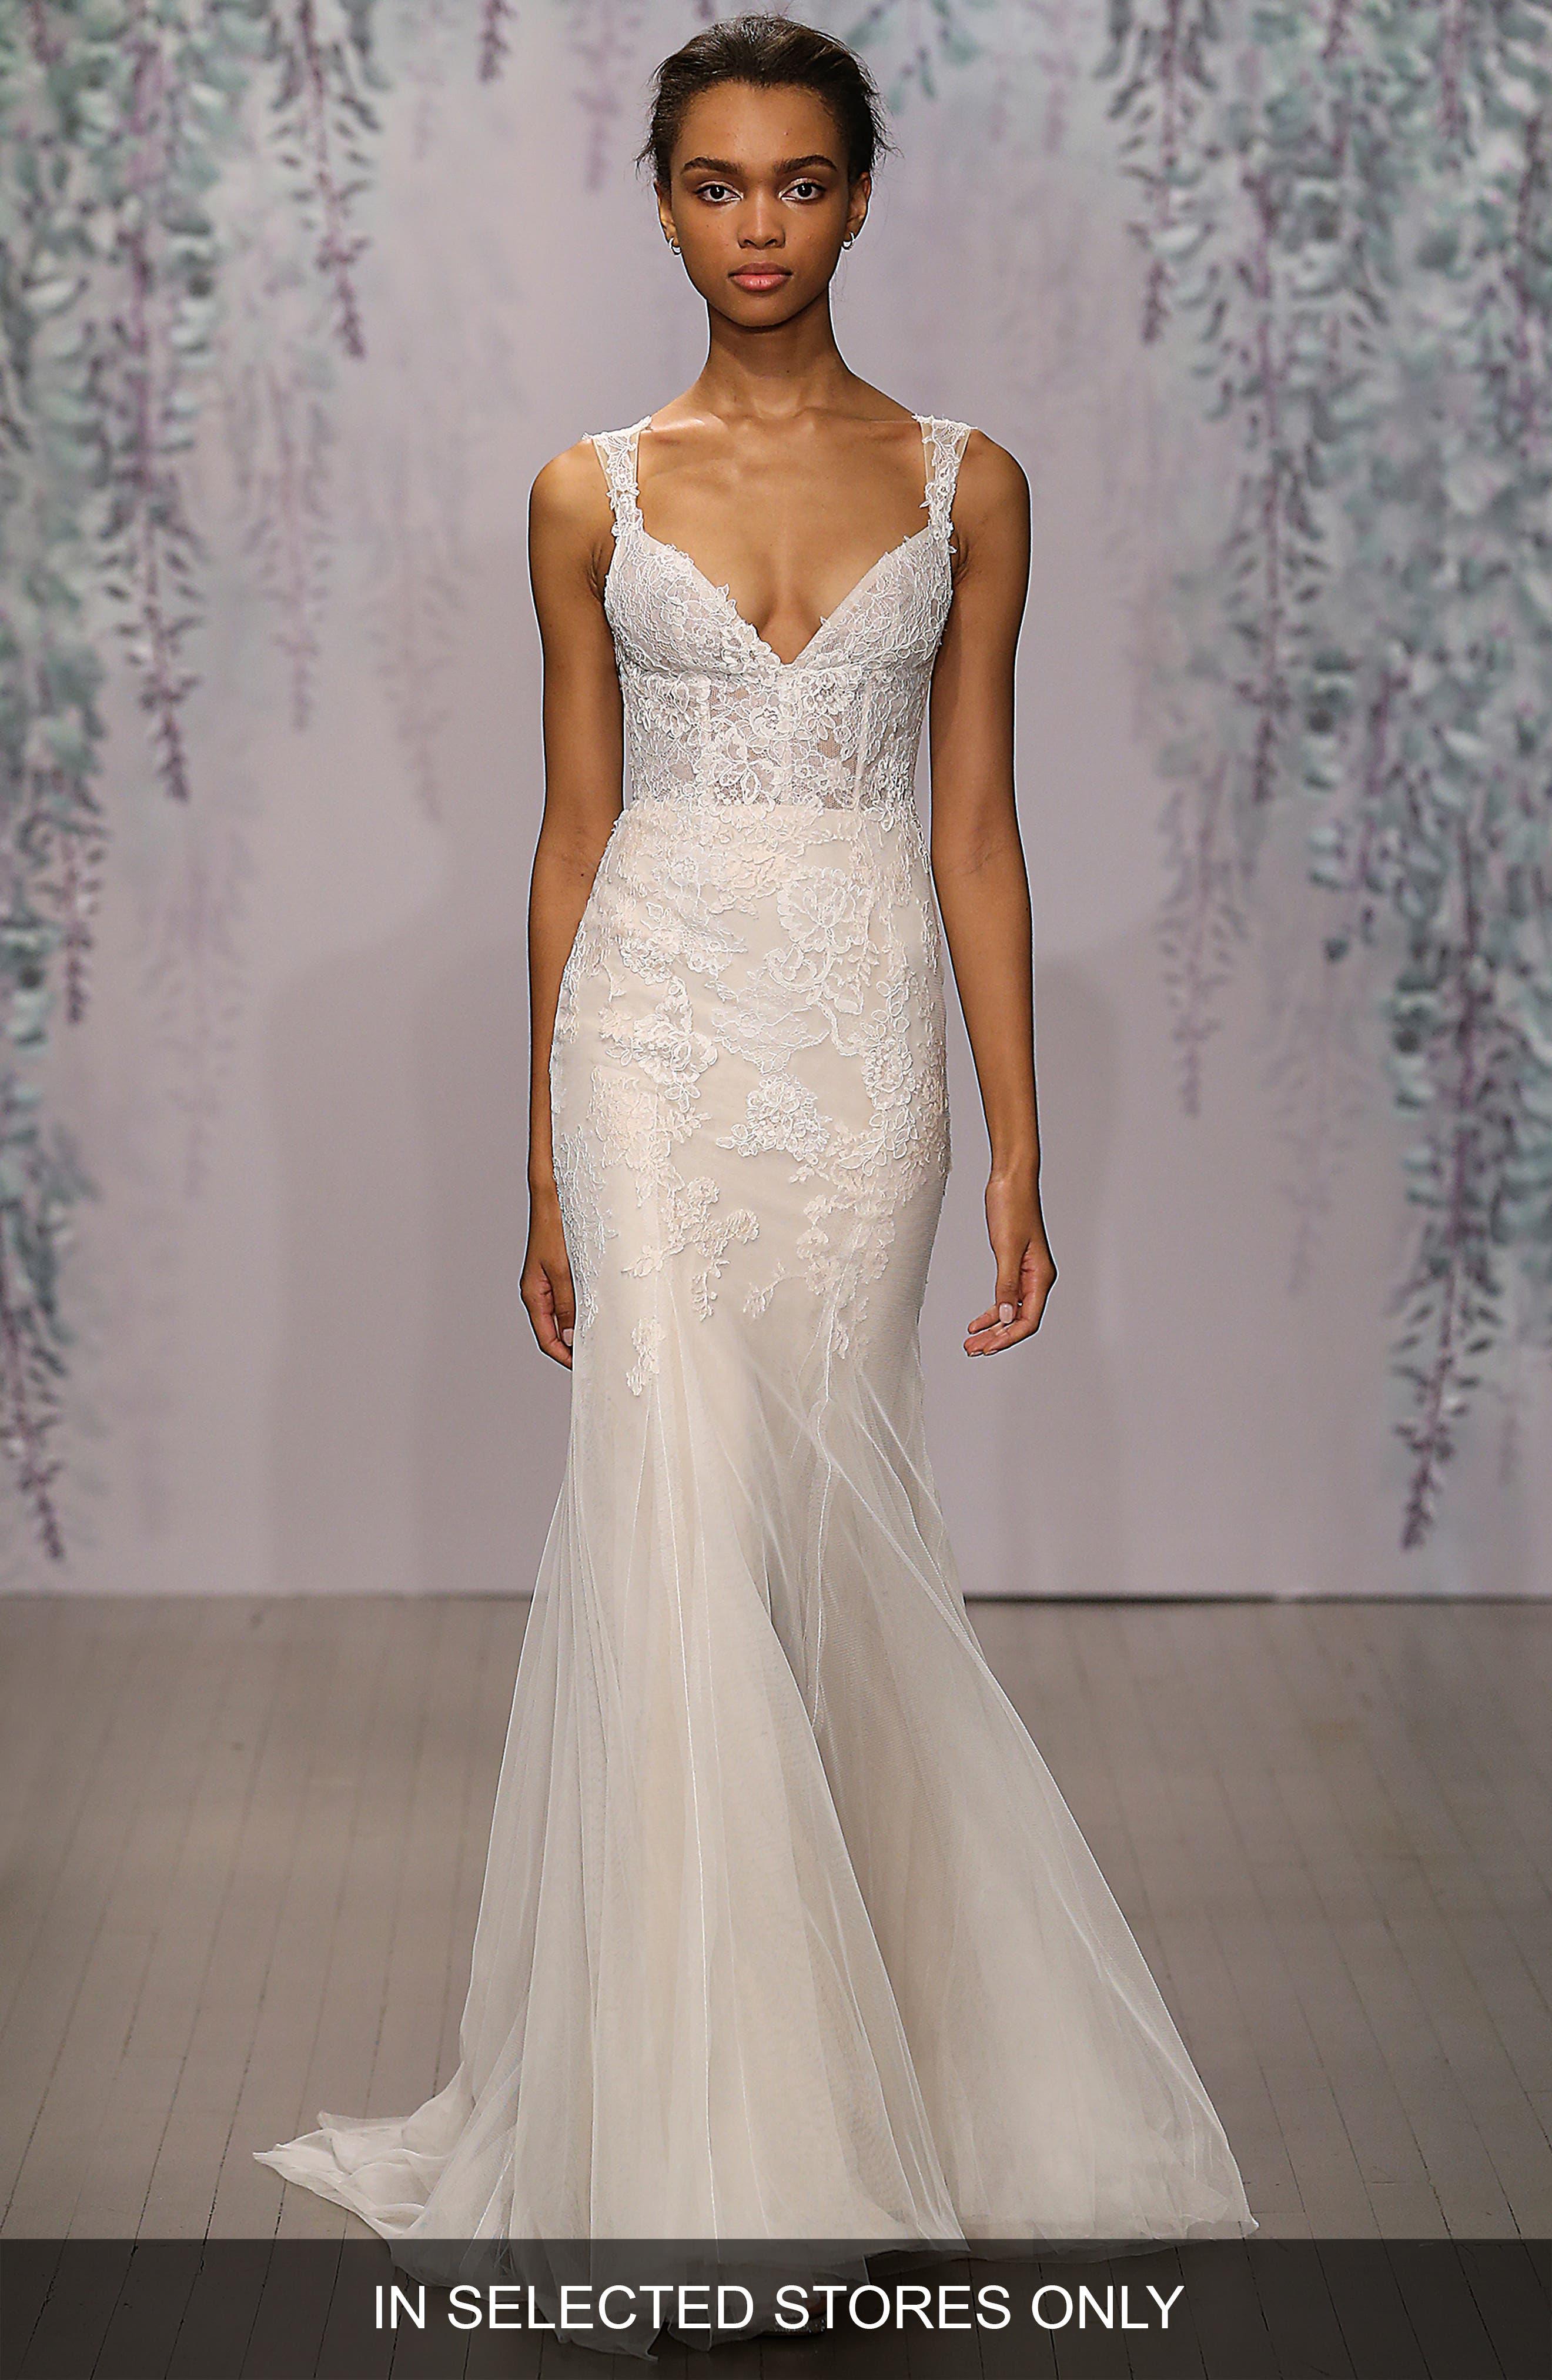 Dulce V-Neck Lace Tulle Sheath Dress,                             Main thumbnail 1, color,                             Silk White/ Sorbet